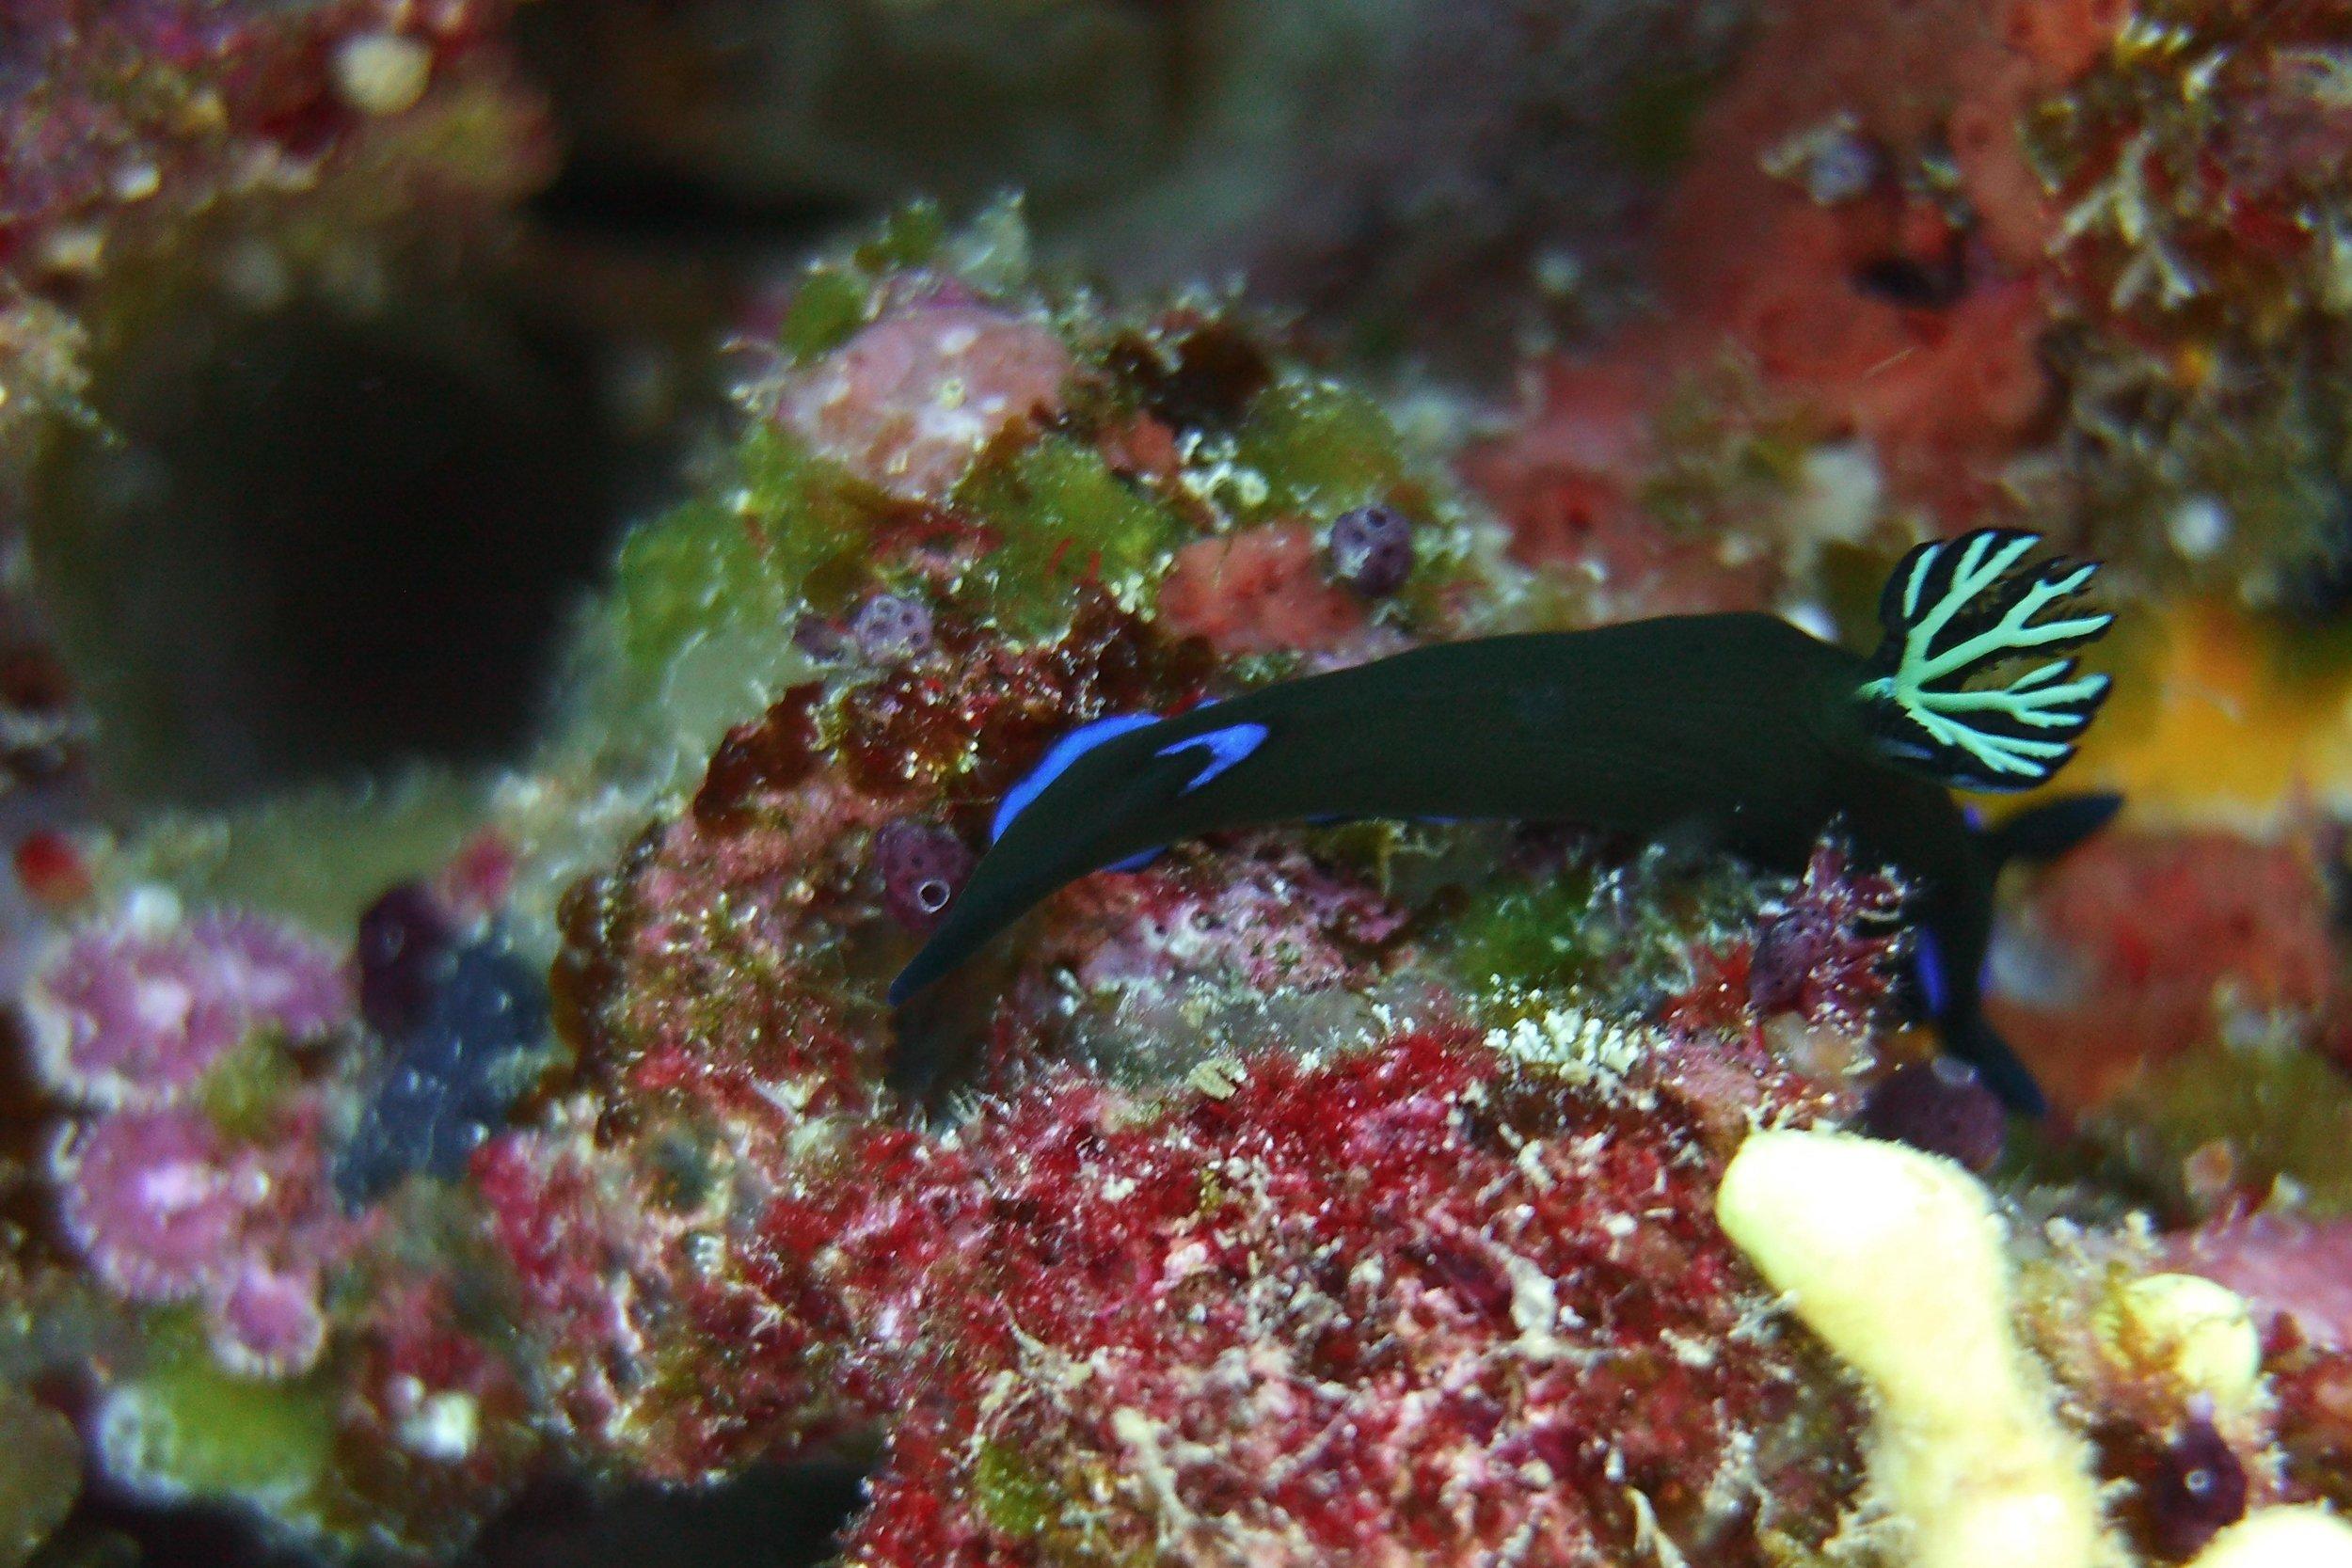 A nudibranch (fancy name for a sea slug)